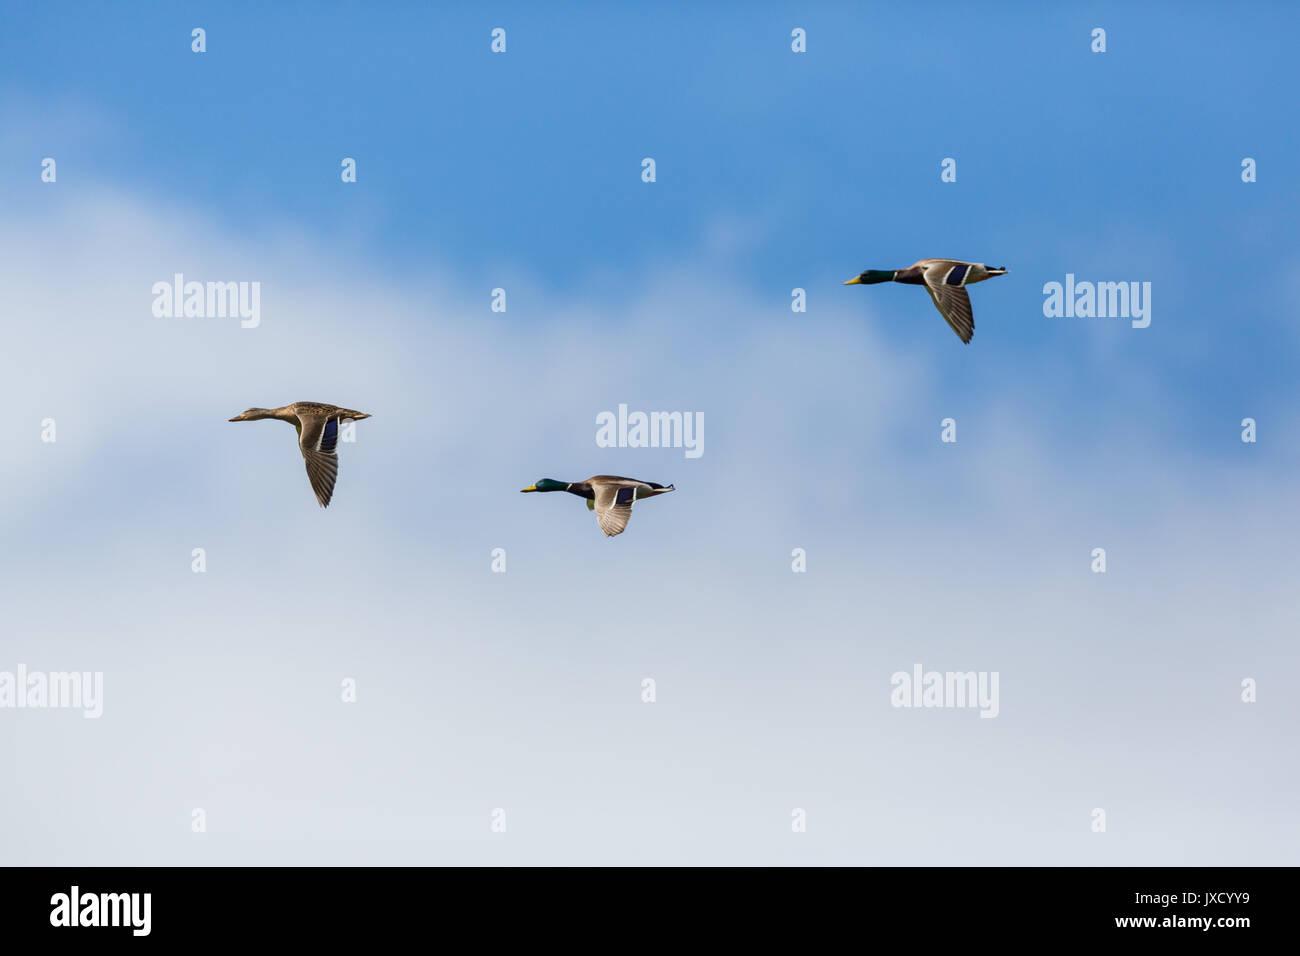 three natural mallard ducks (anas platyrhynchos) flying, clouds, blue sky - Stock Image